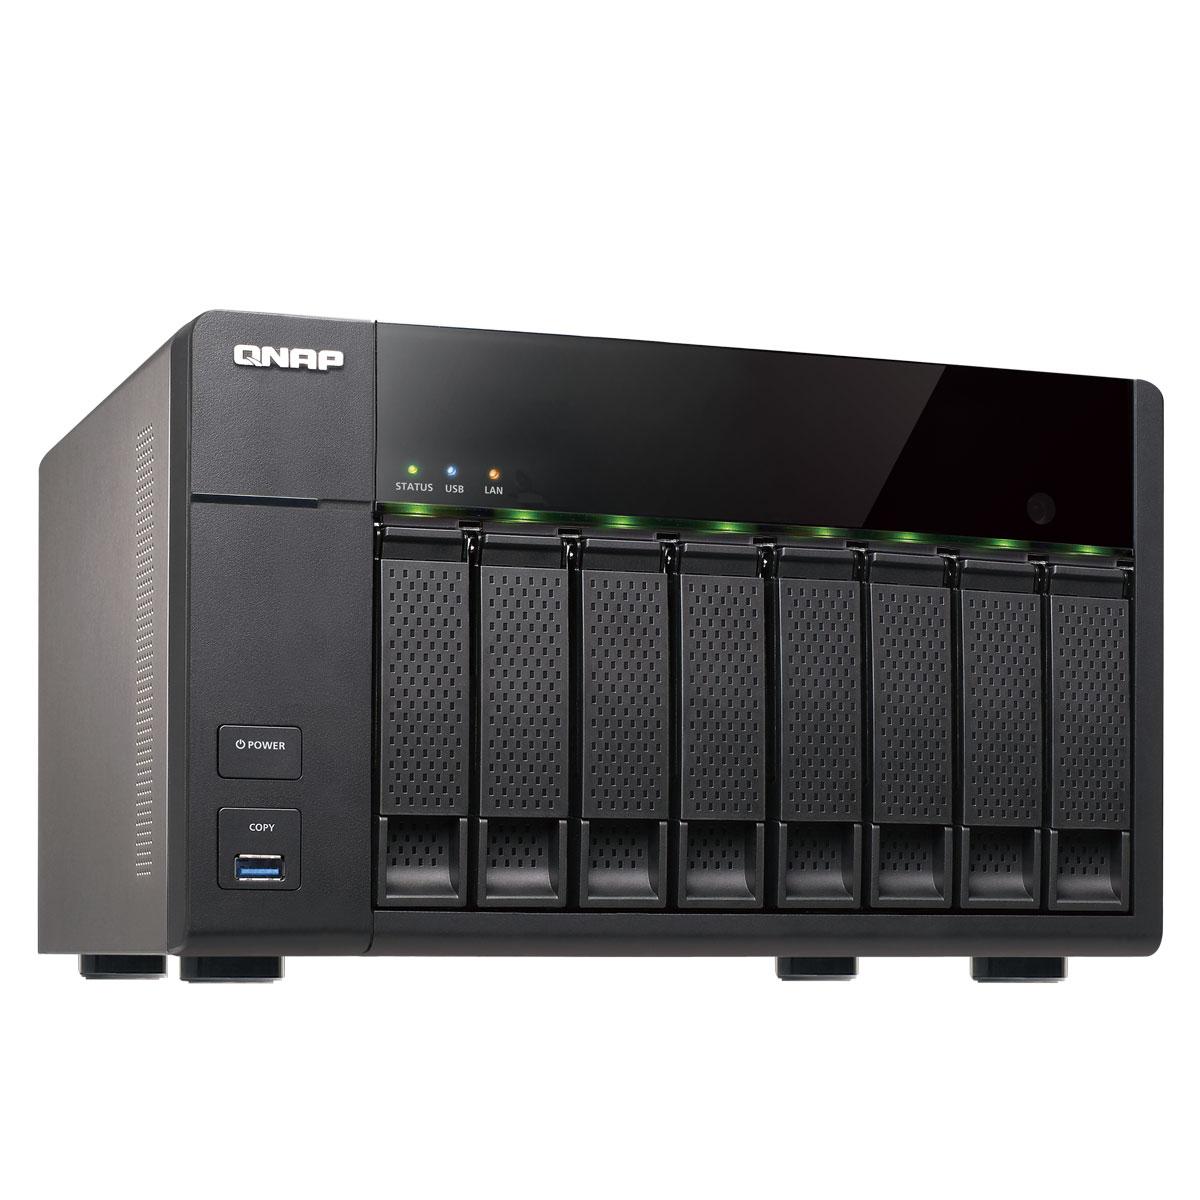 QNAP TS-851 сетевой RAID-накопитель